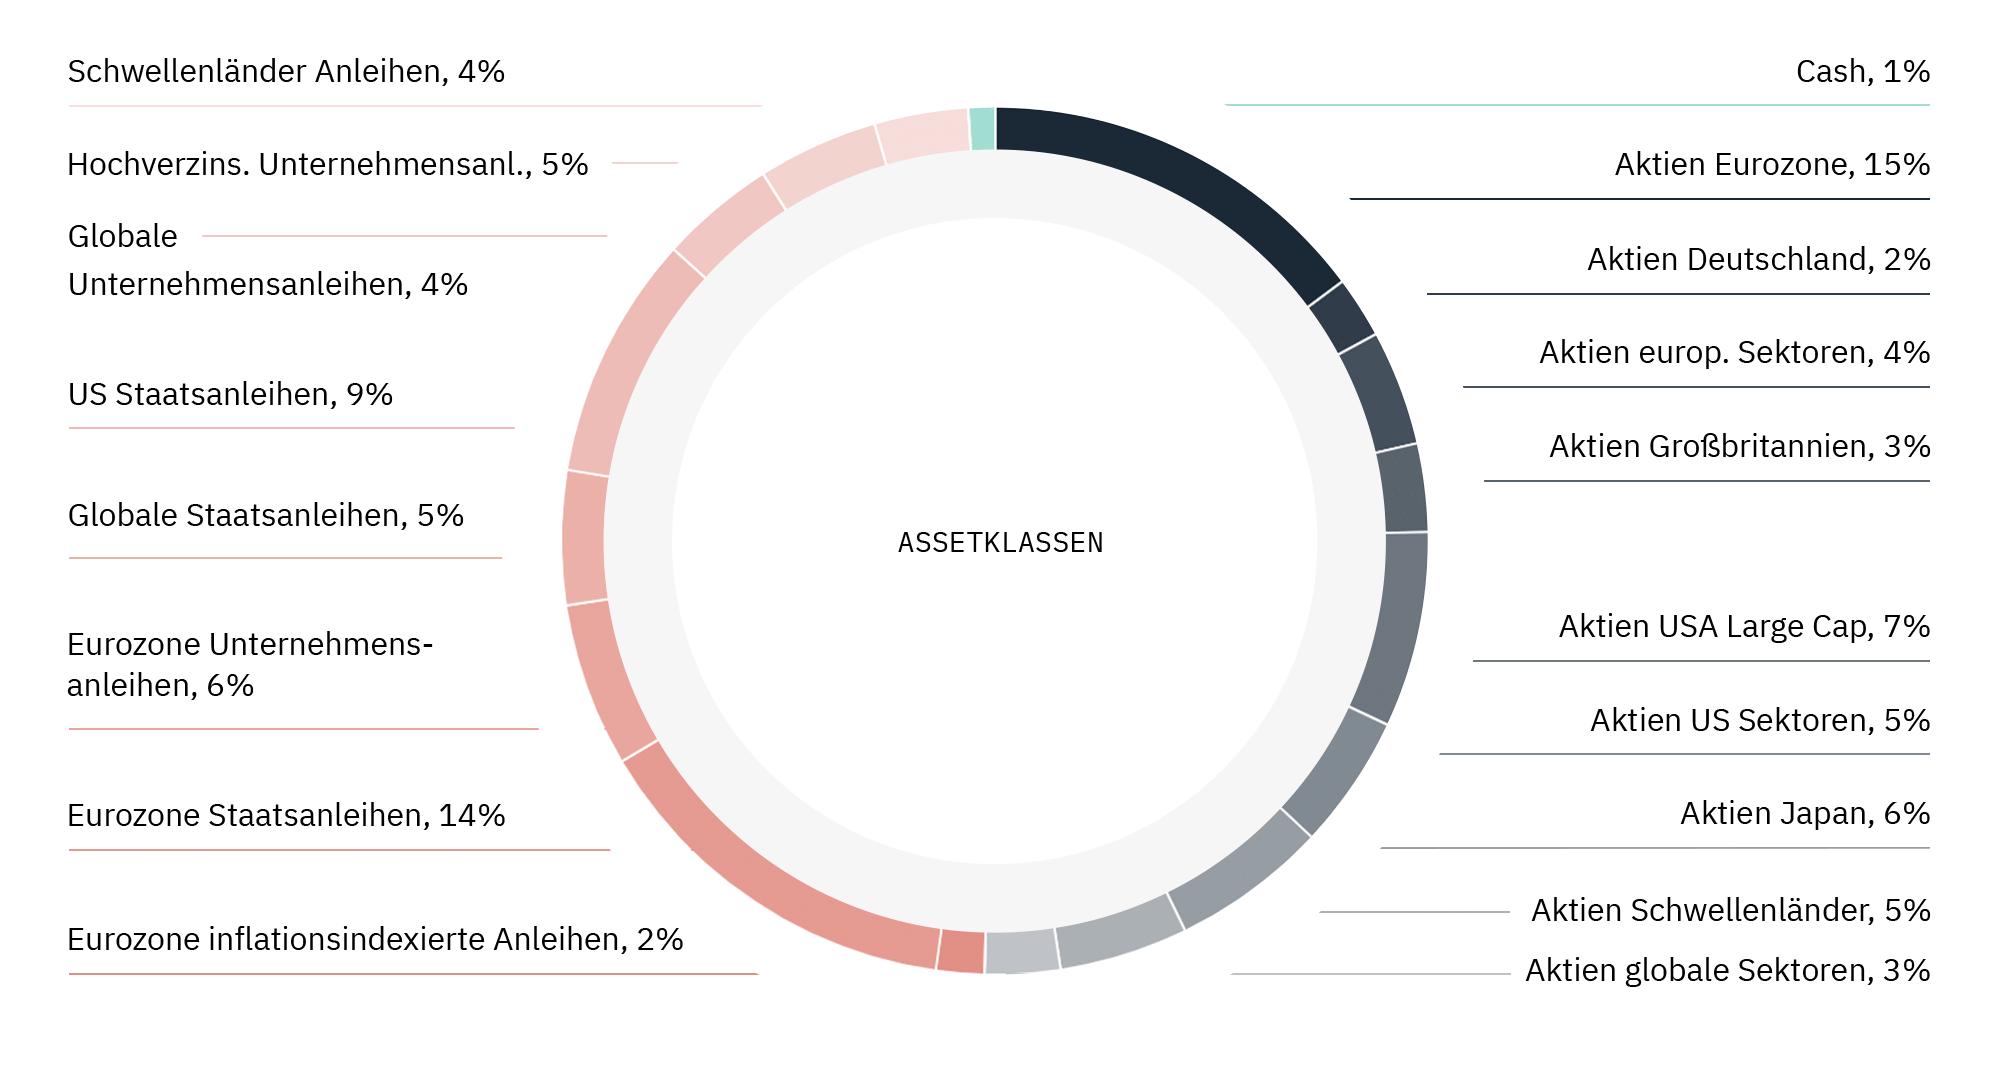 portfolio_assets